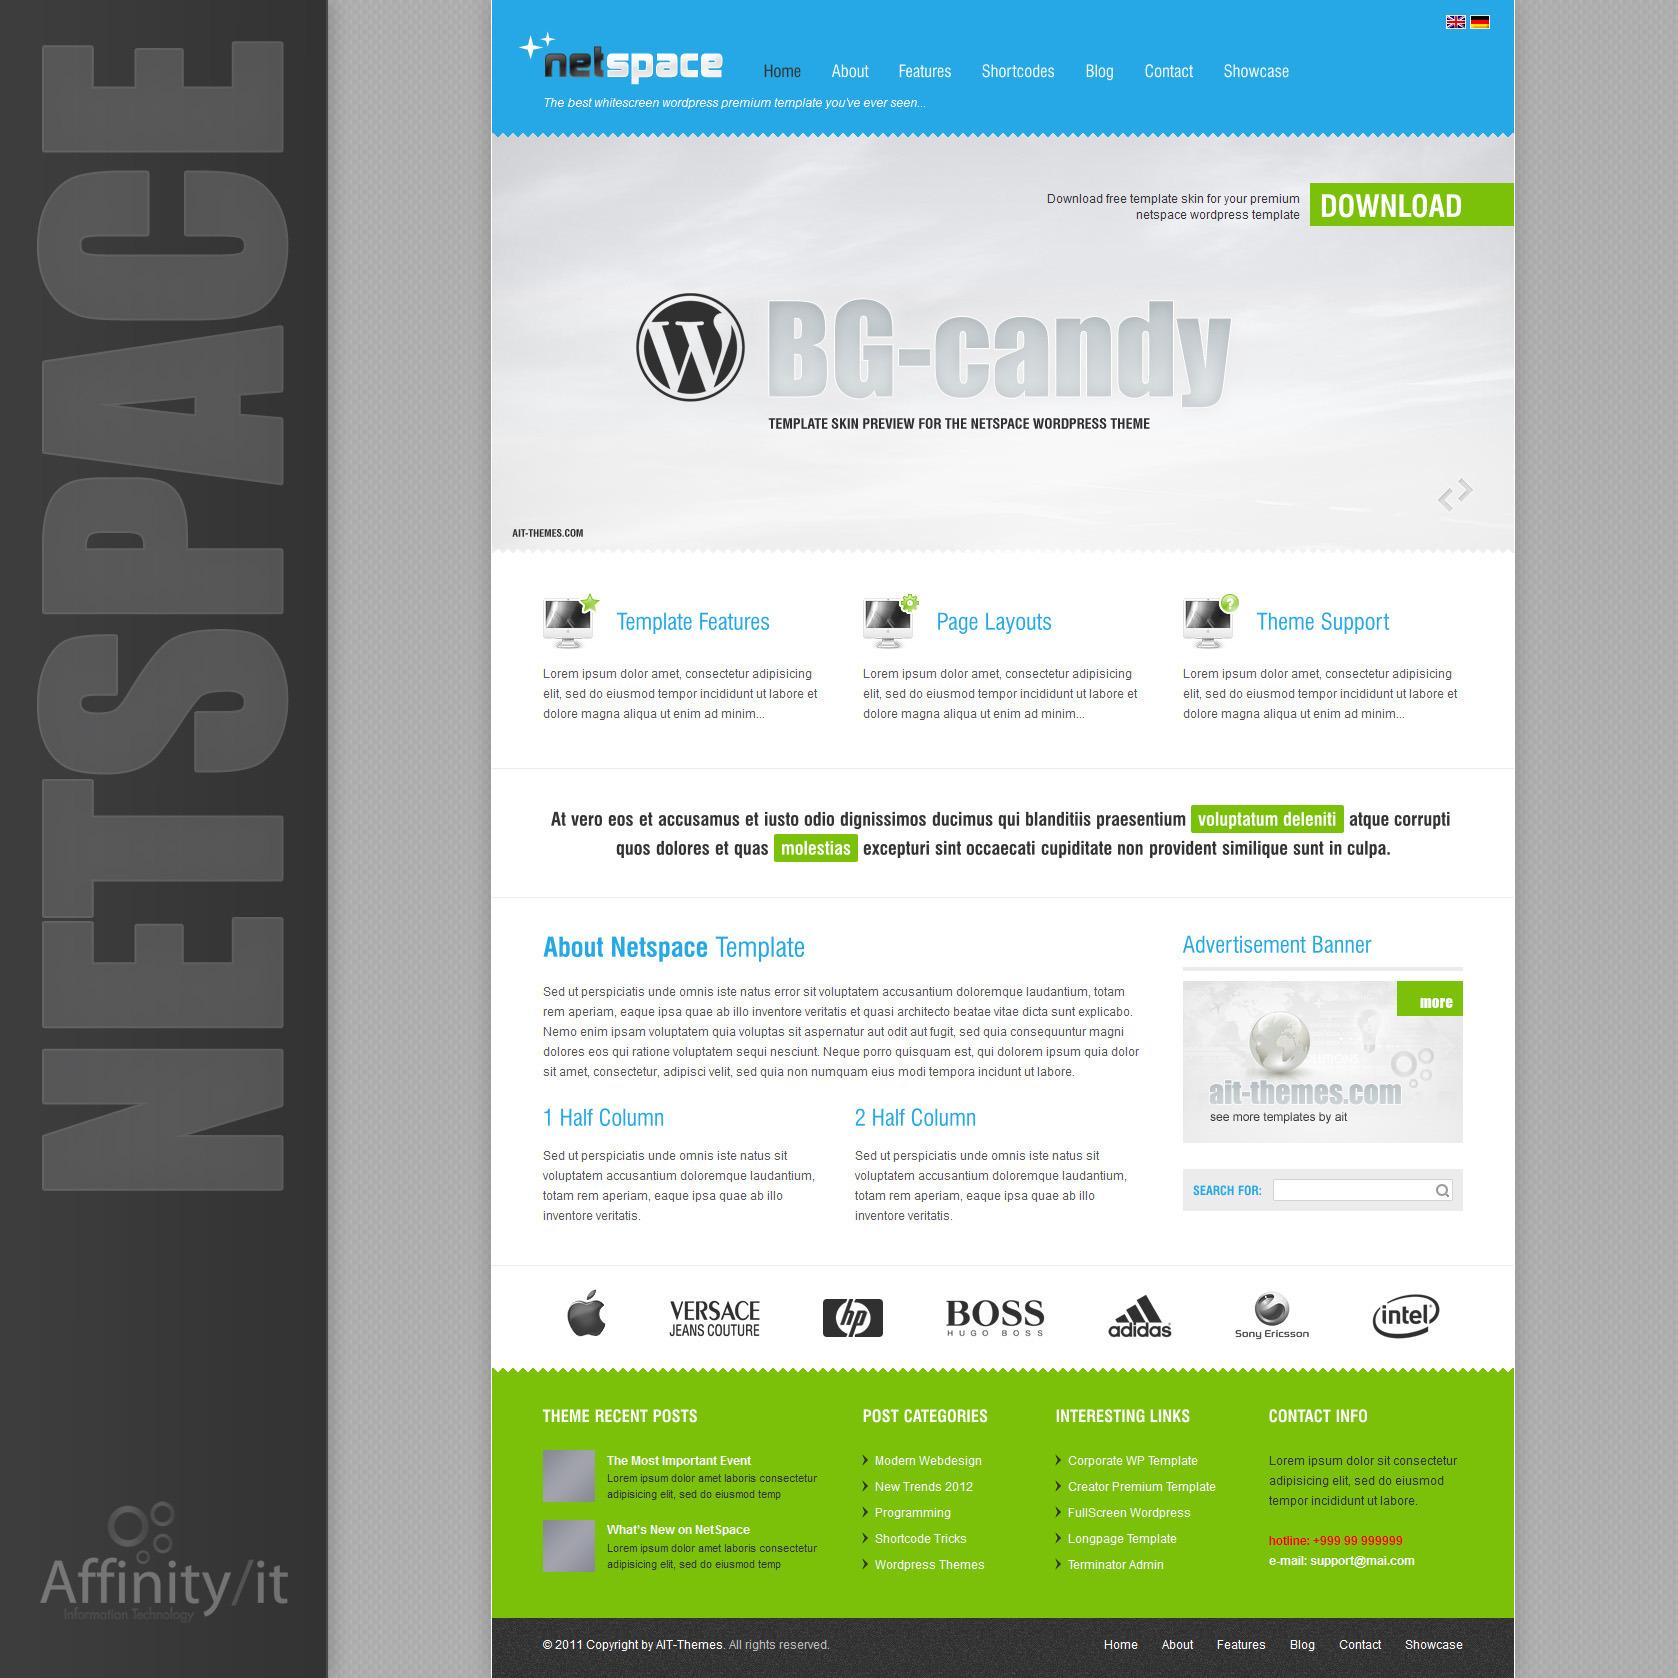 Netspace - Premium Wordpress Theme + Free Skins